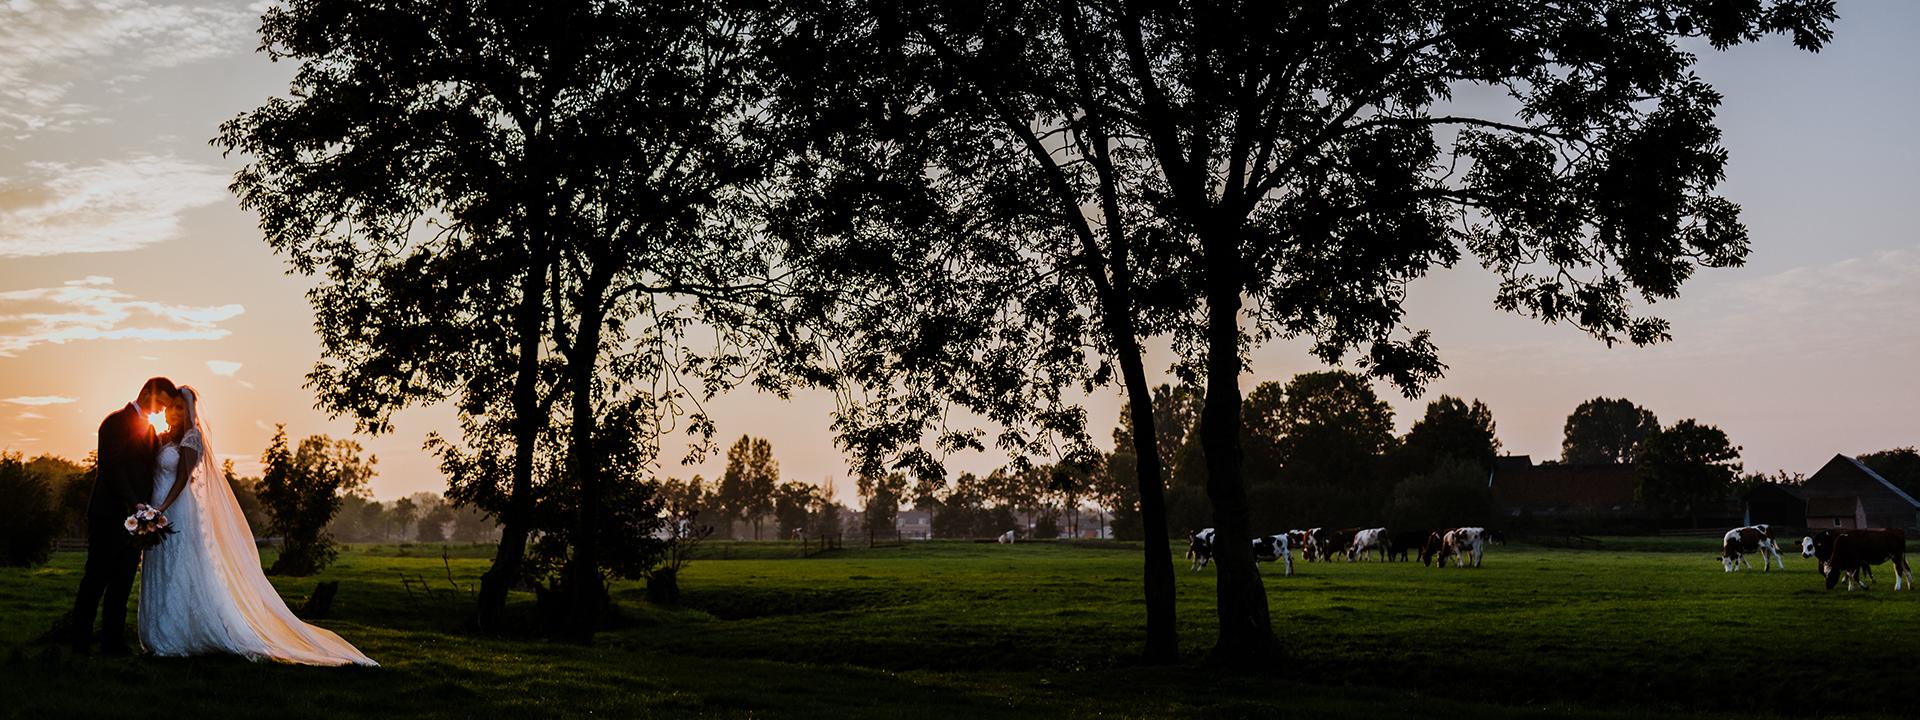 trouwfotograaf-rotterdam-banner-61